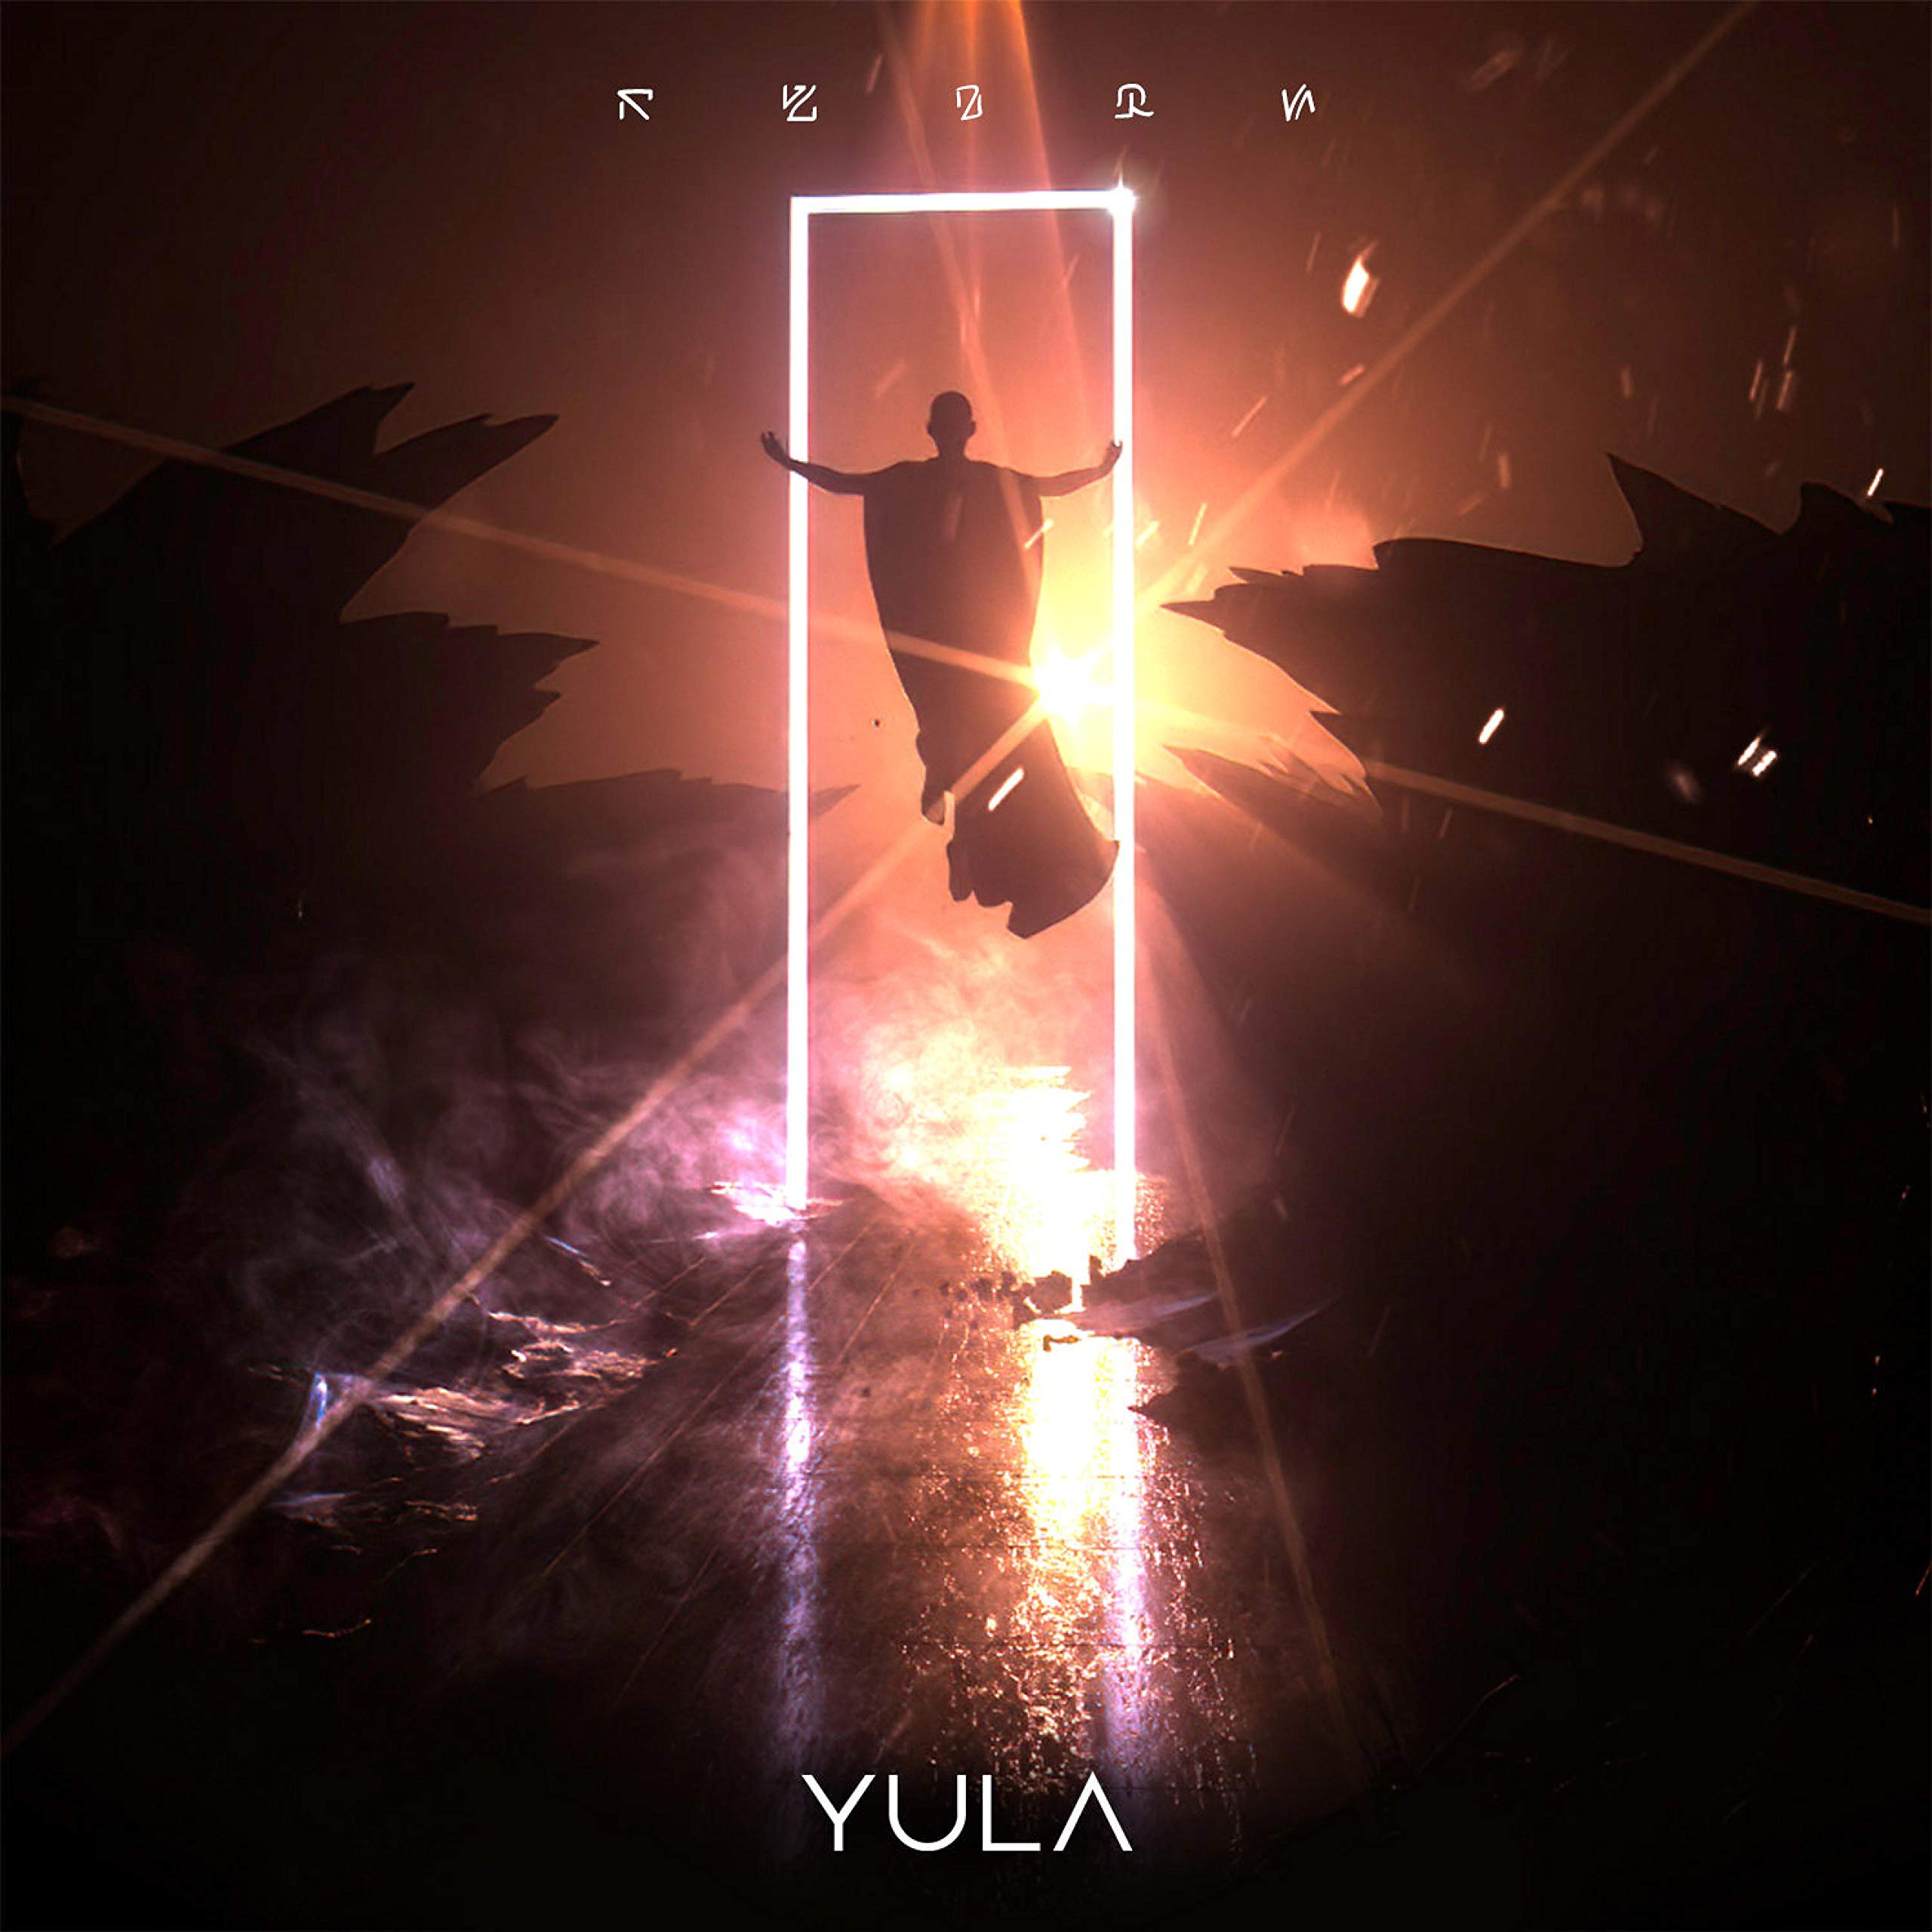 Yula - Venus (2021) [FLAC] Download